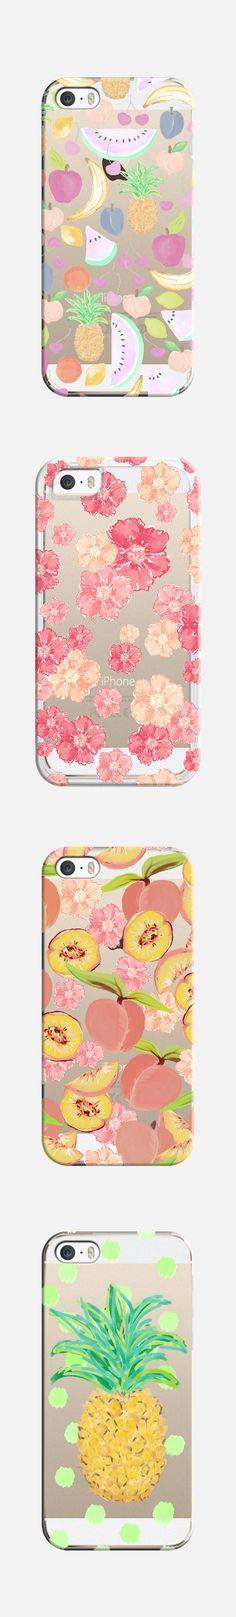 1366x768 apple logo flower - photo #38